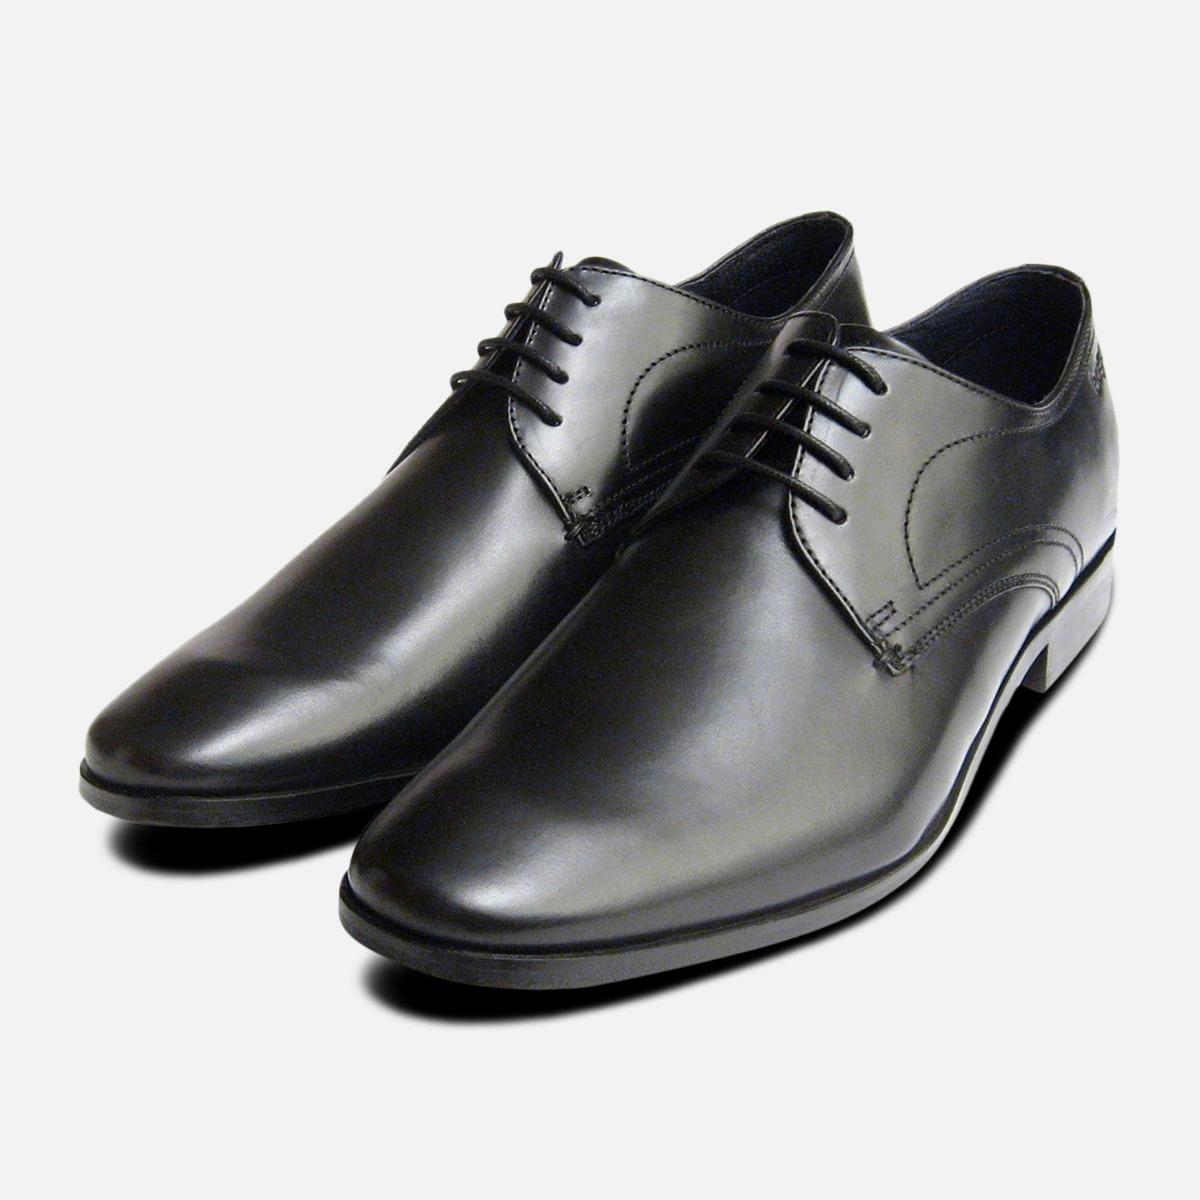 Mens Formal Designer Bugatti Shoes in